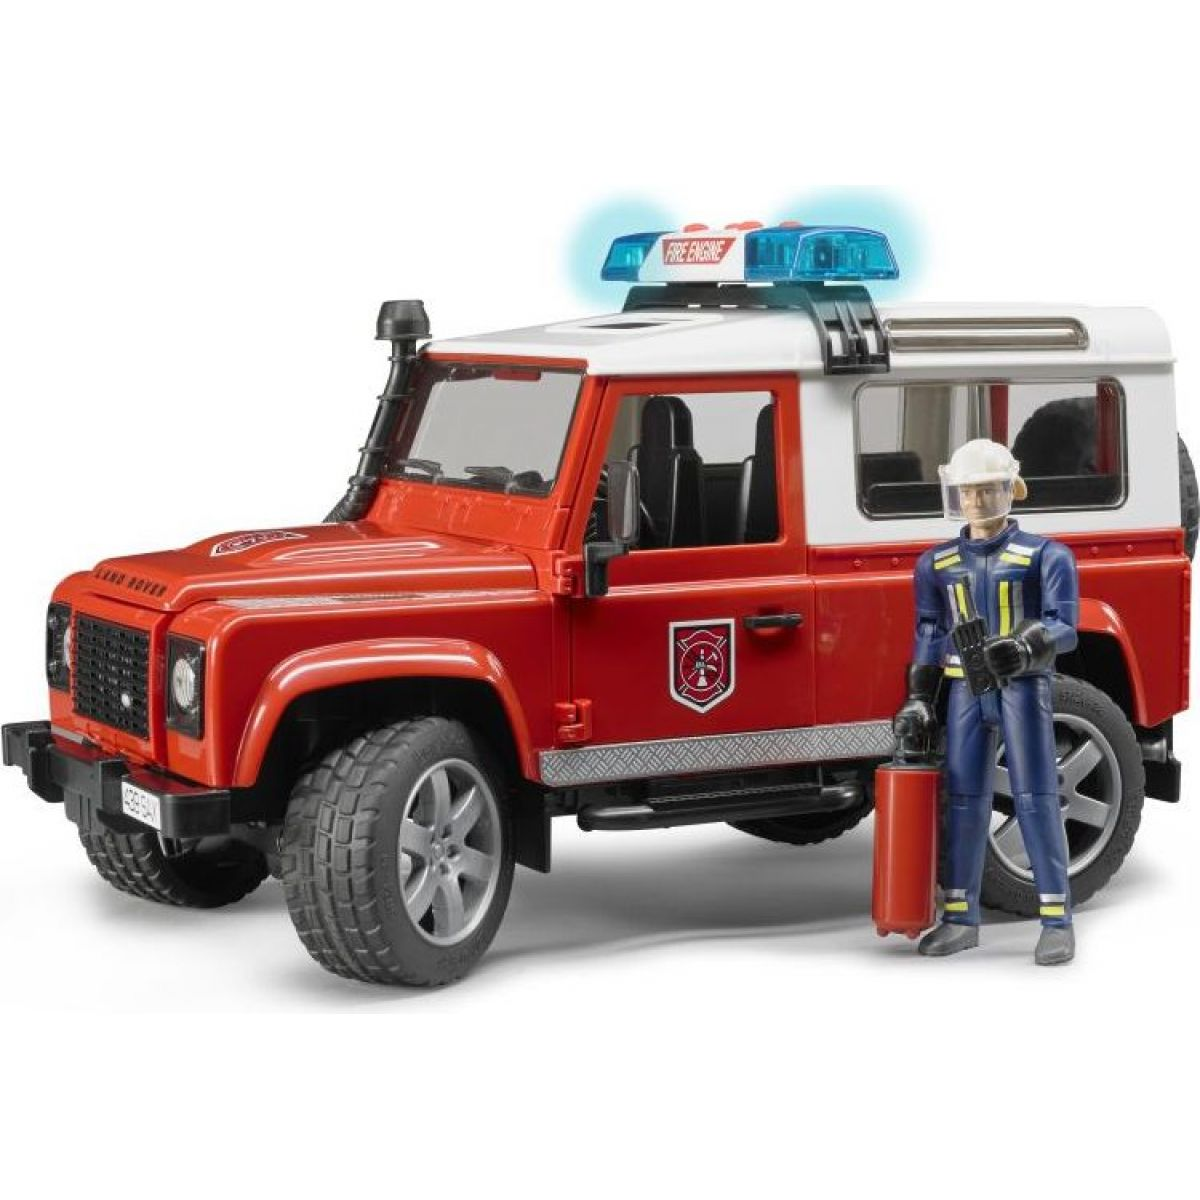 Bruder 2596 Land Rover Defender - Hasičské auto s figurkou hasiče